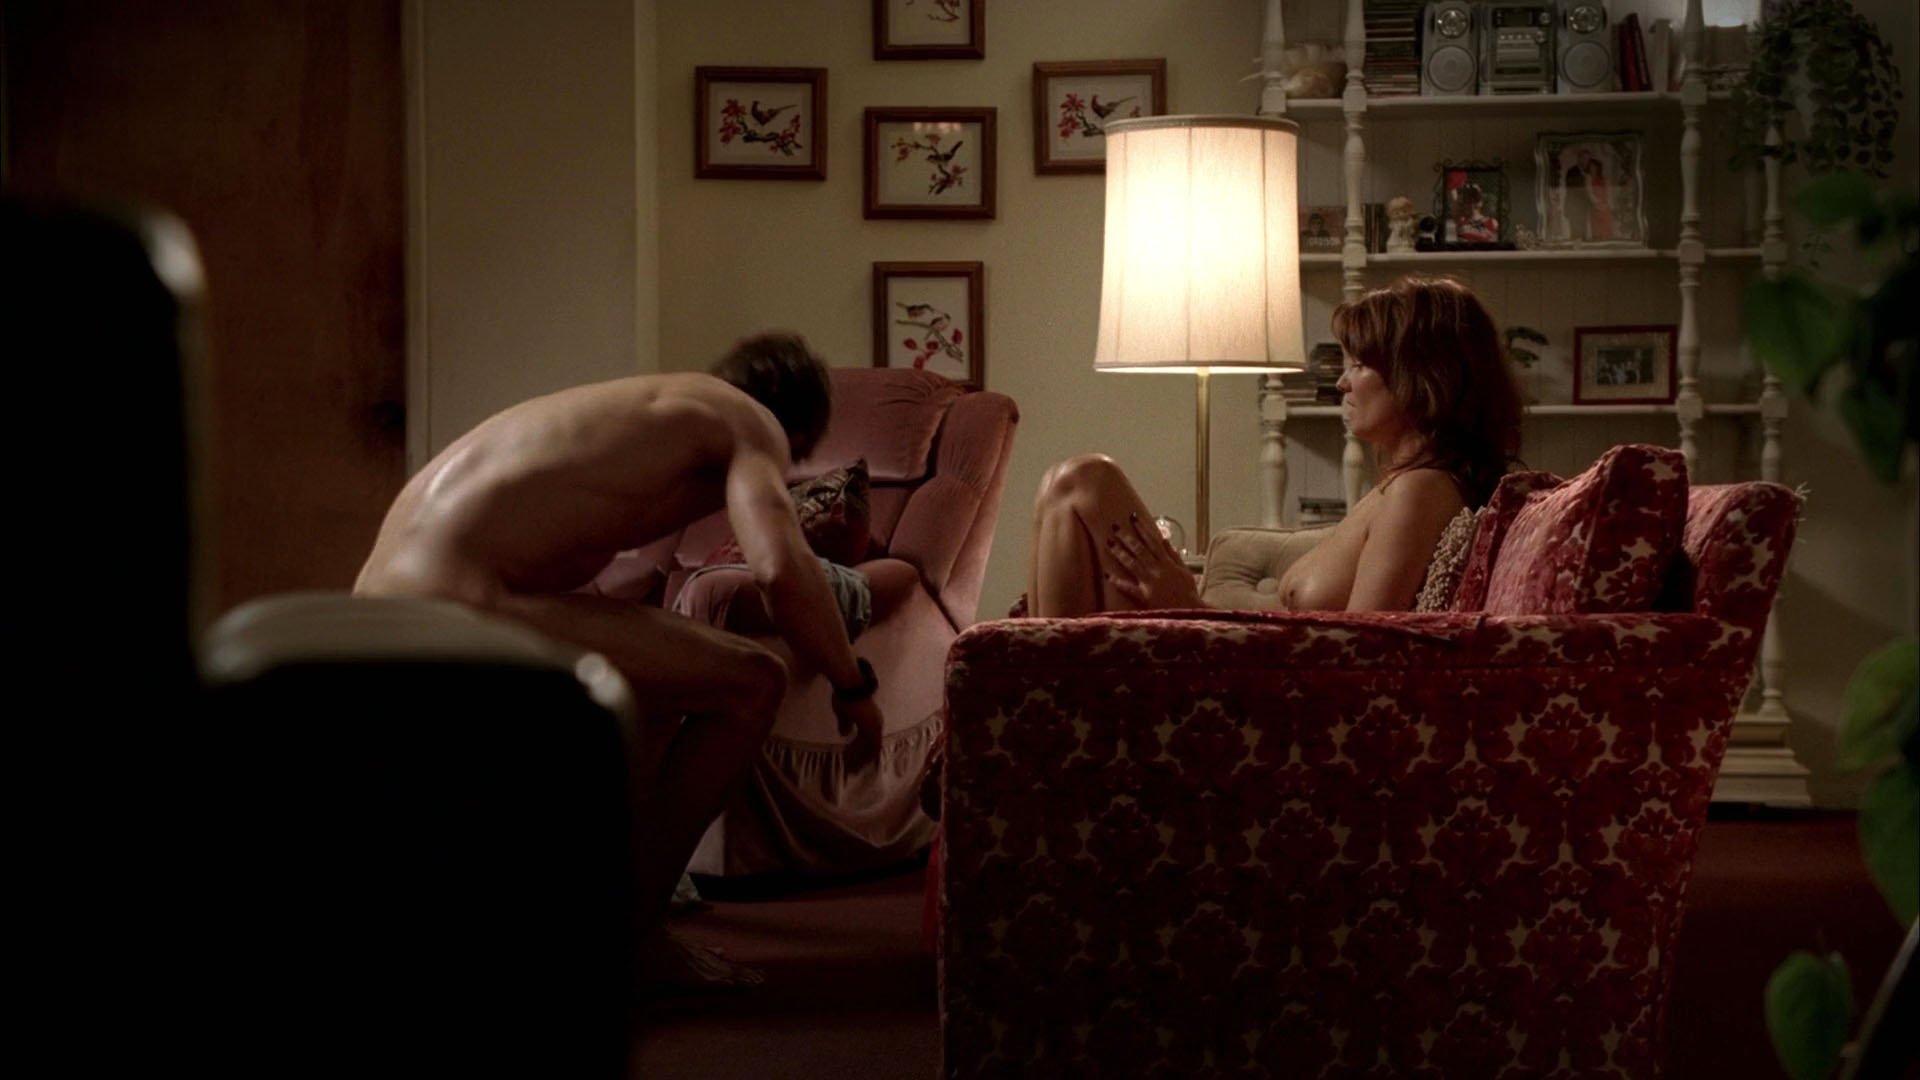 Danielle Sapia nude - True Blood s01e01 (2008)